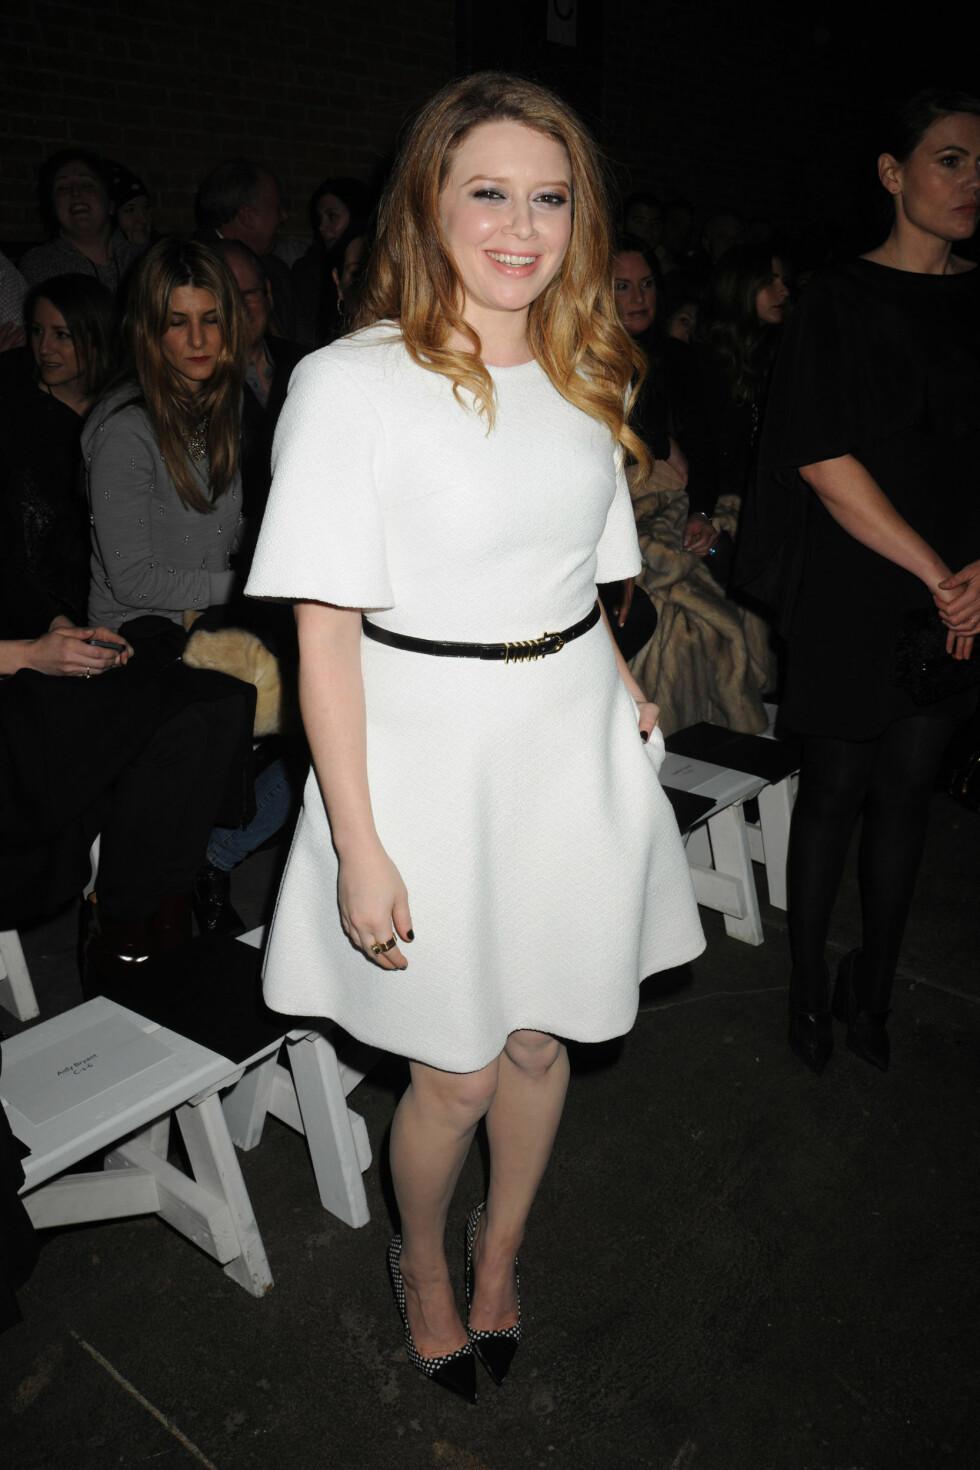 Skuespillerinnen Natasha Lyonne derimot, var iført en hvit kjole med et sort belte i livet og et par pumps med ruter og sorte detaljer.  Foto: All Over Press